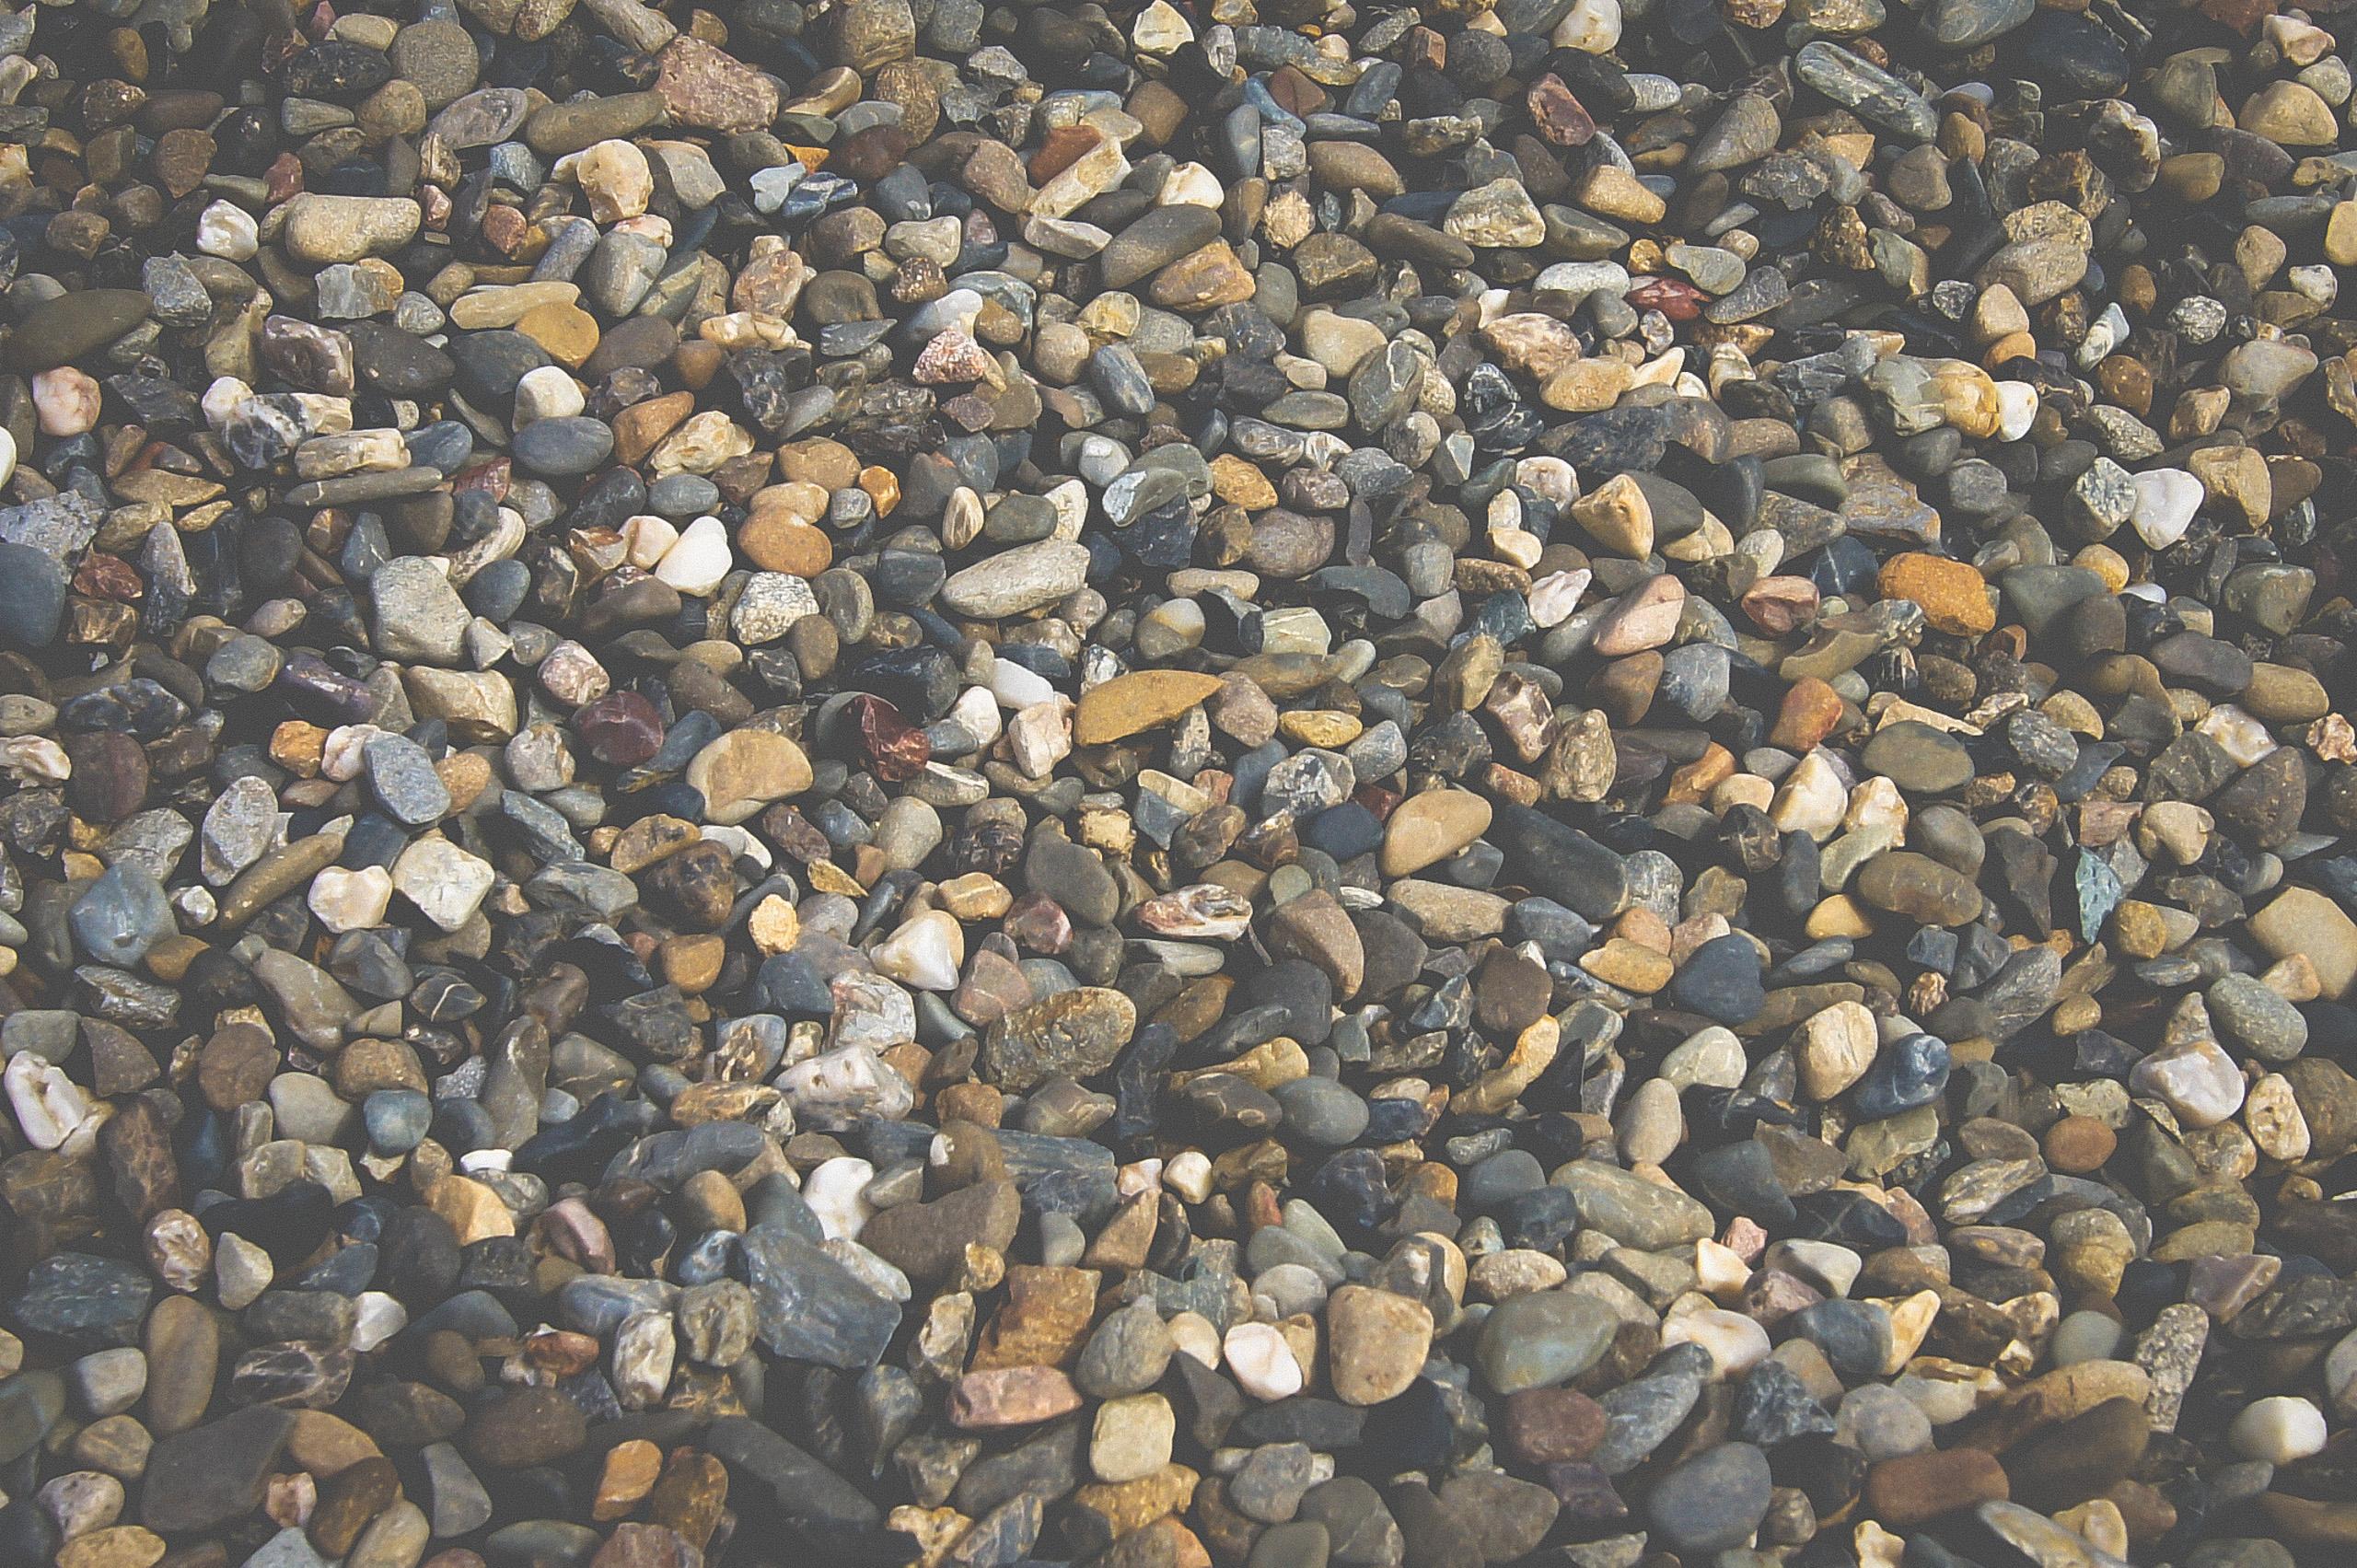 Grey River Pebble 10mm Closeup Landscape Supply Photography